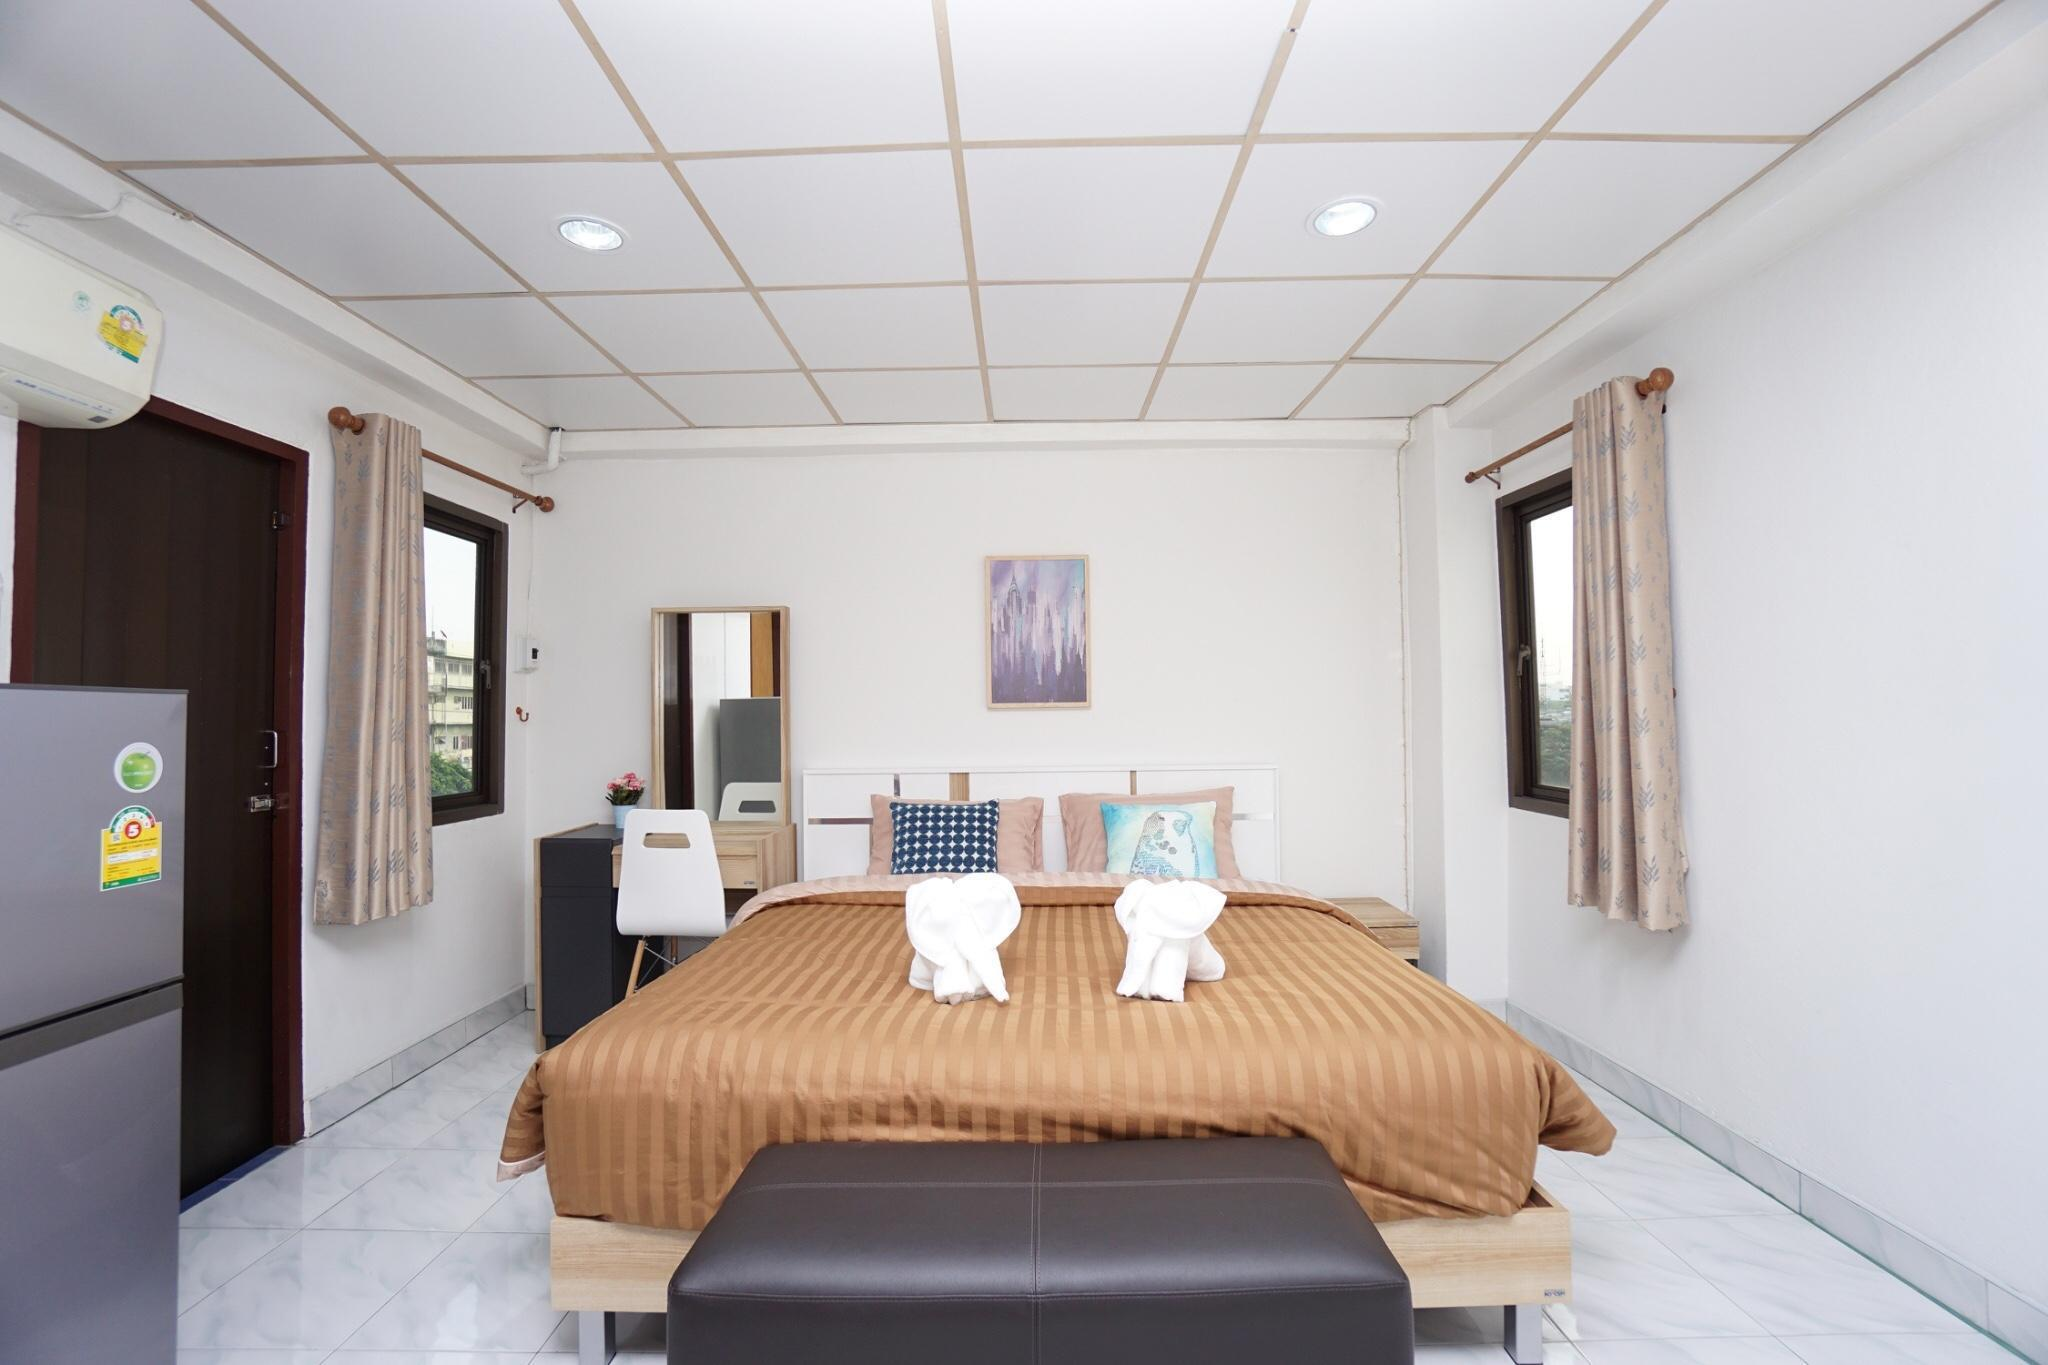 Best and cheap private room near Khaosan! 506 สตูดิโอ อพาร์ตเมนต์ 1 ห้องน้ำส่วนตัว ขนาด 15 ตร.ม. – เยาวราช